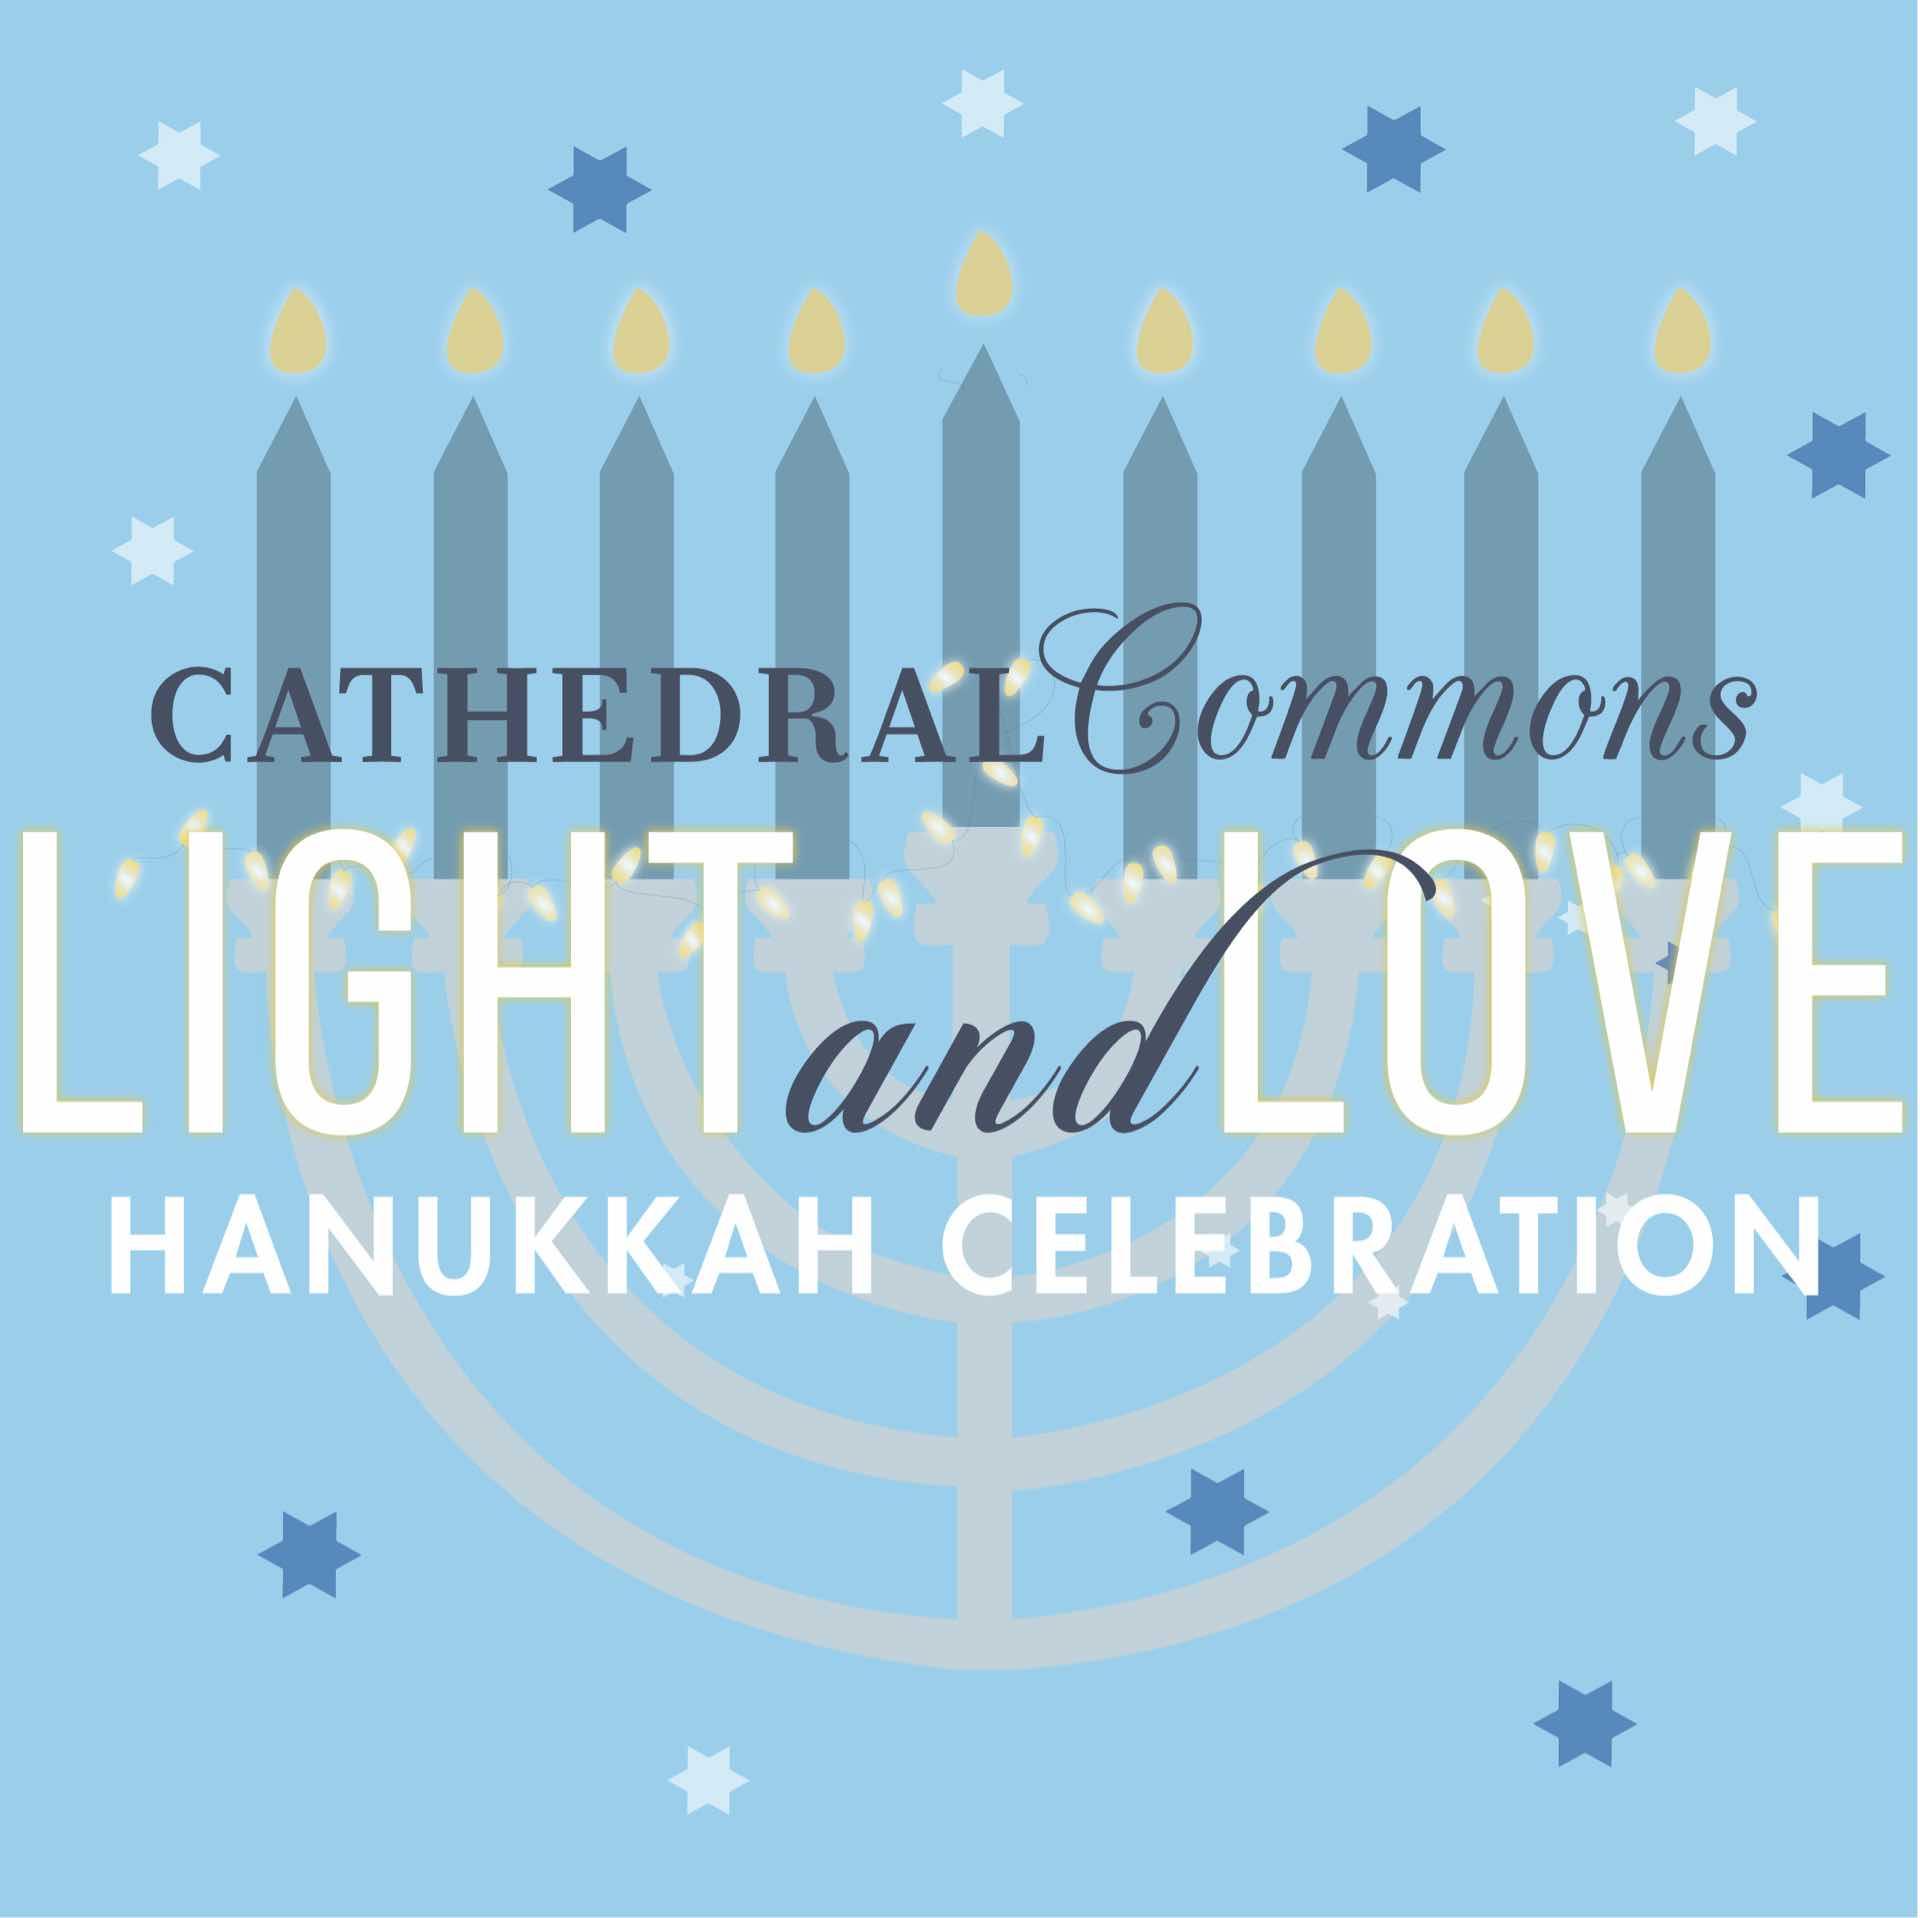 Light and Love Hanukkah Celebration!